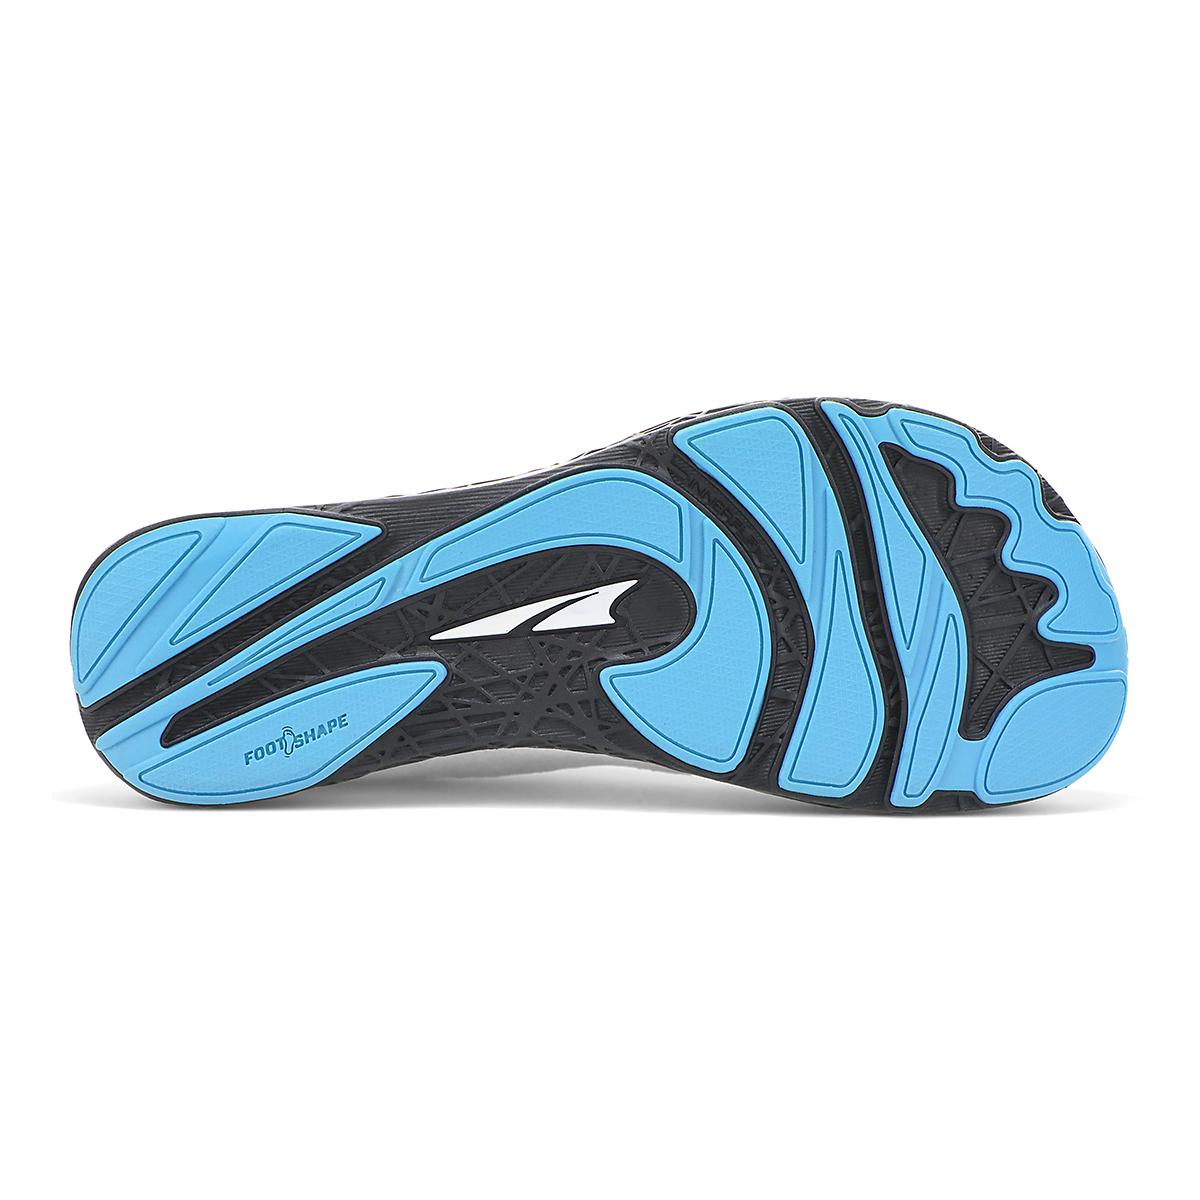 Women's Altra Escalante 2.5 Running Shoe - Color: White/Blue - Size: 5.5 - Width: Regular, White/Blue, large, image 4